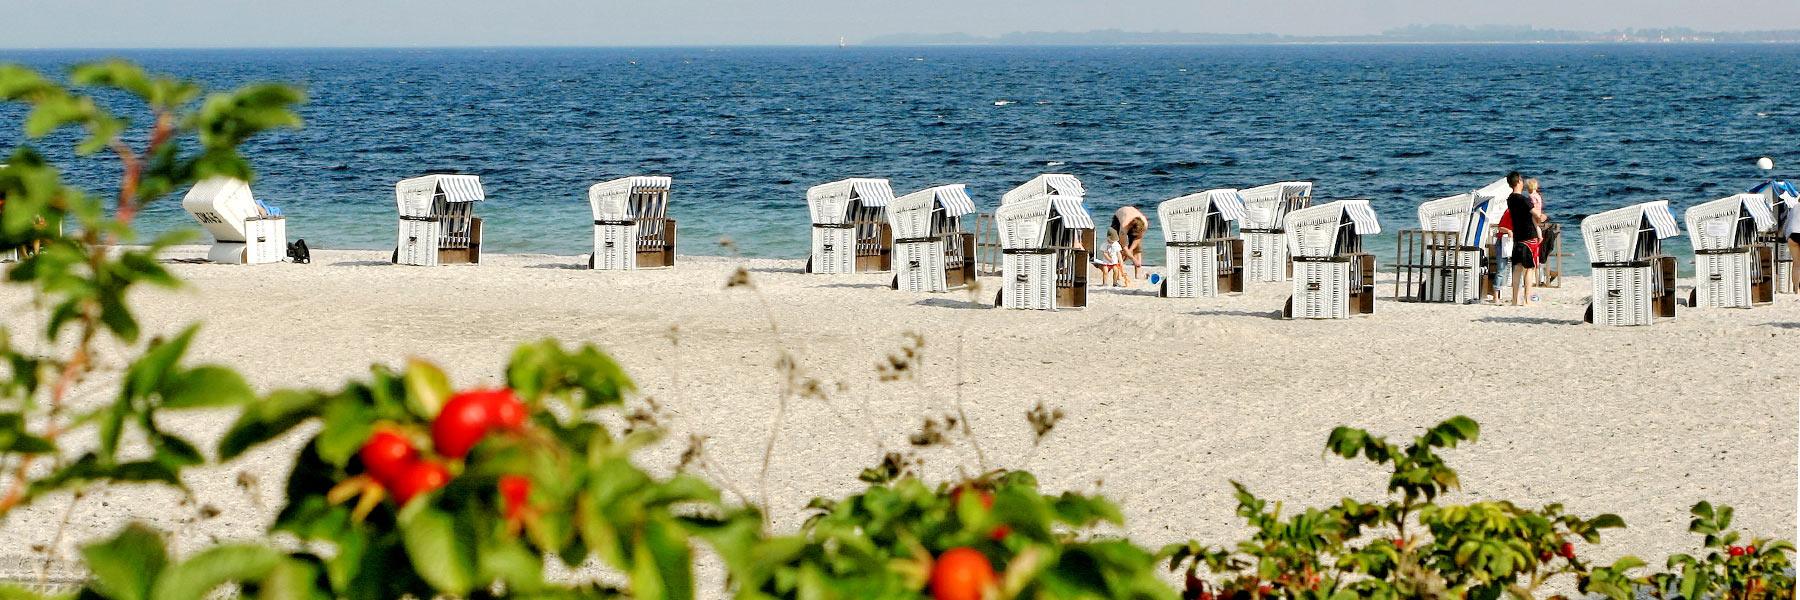 Ostsee - Das Strandhaus